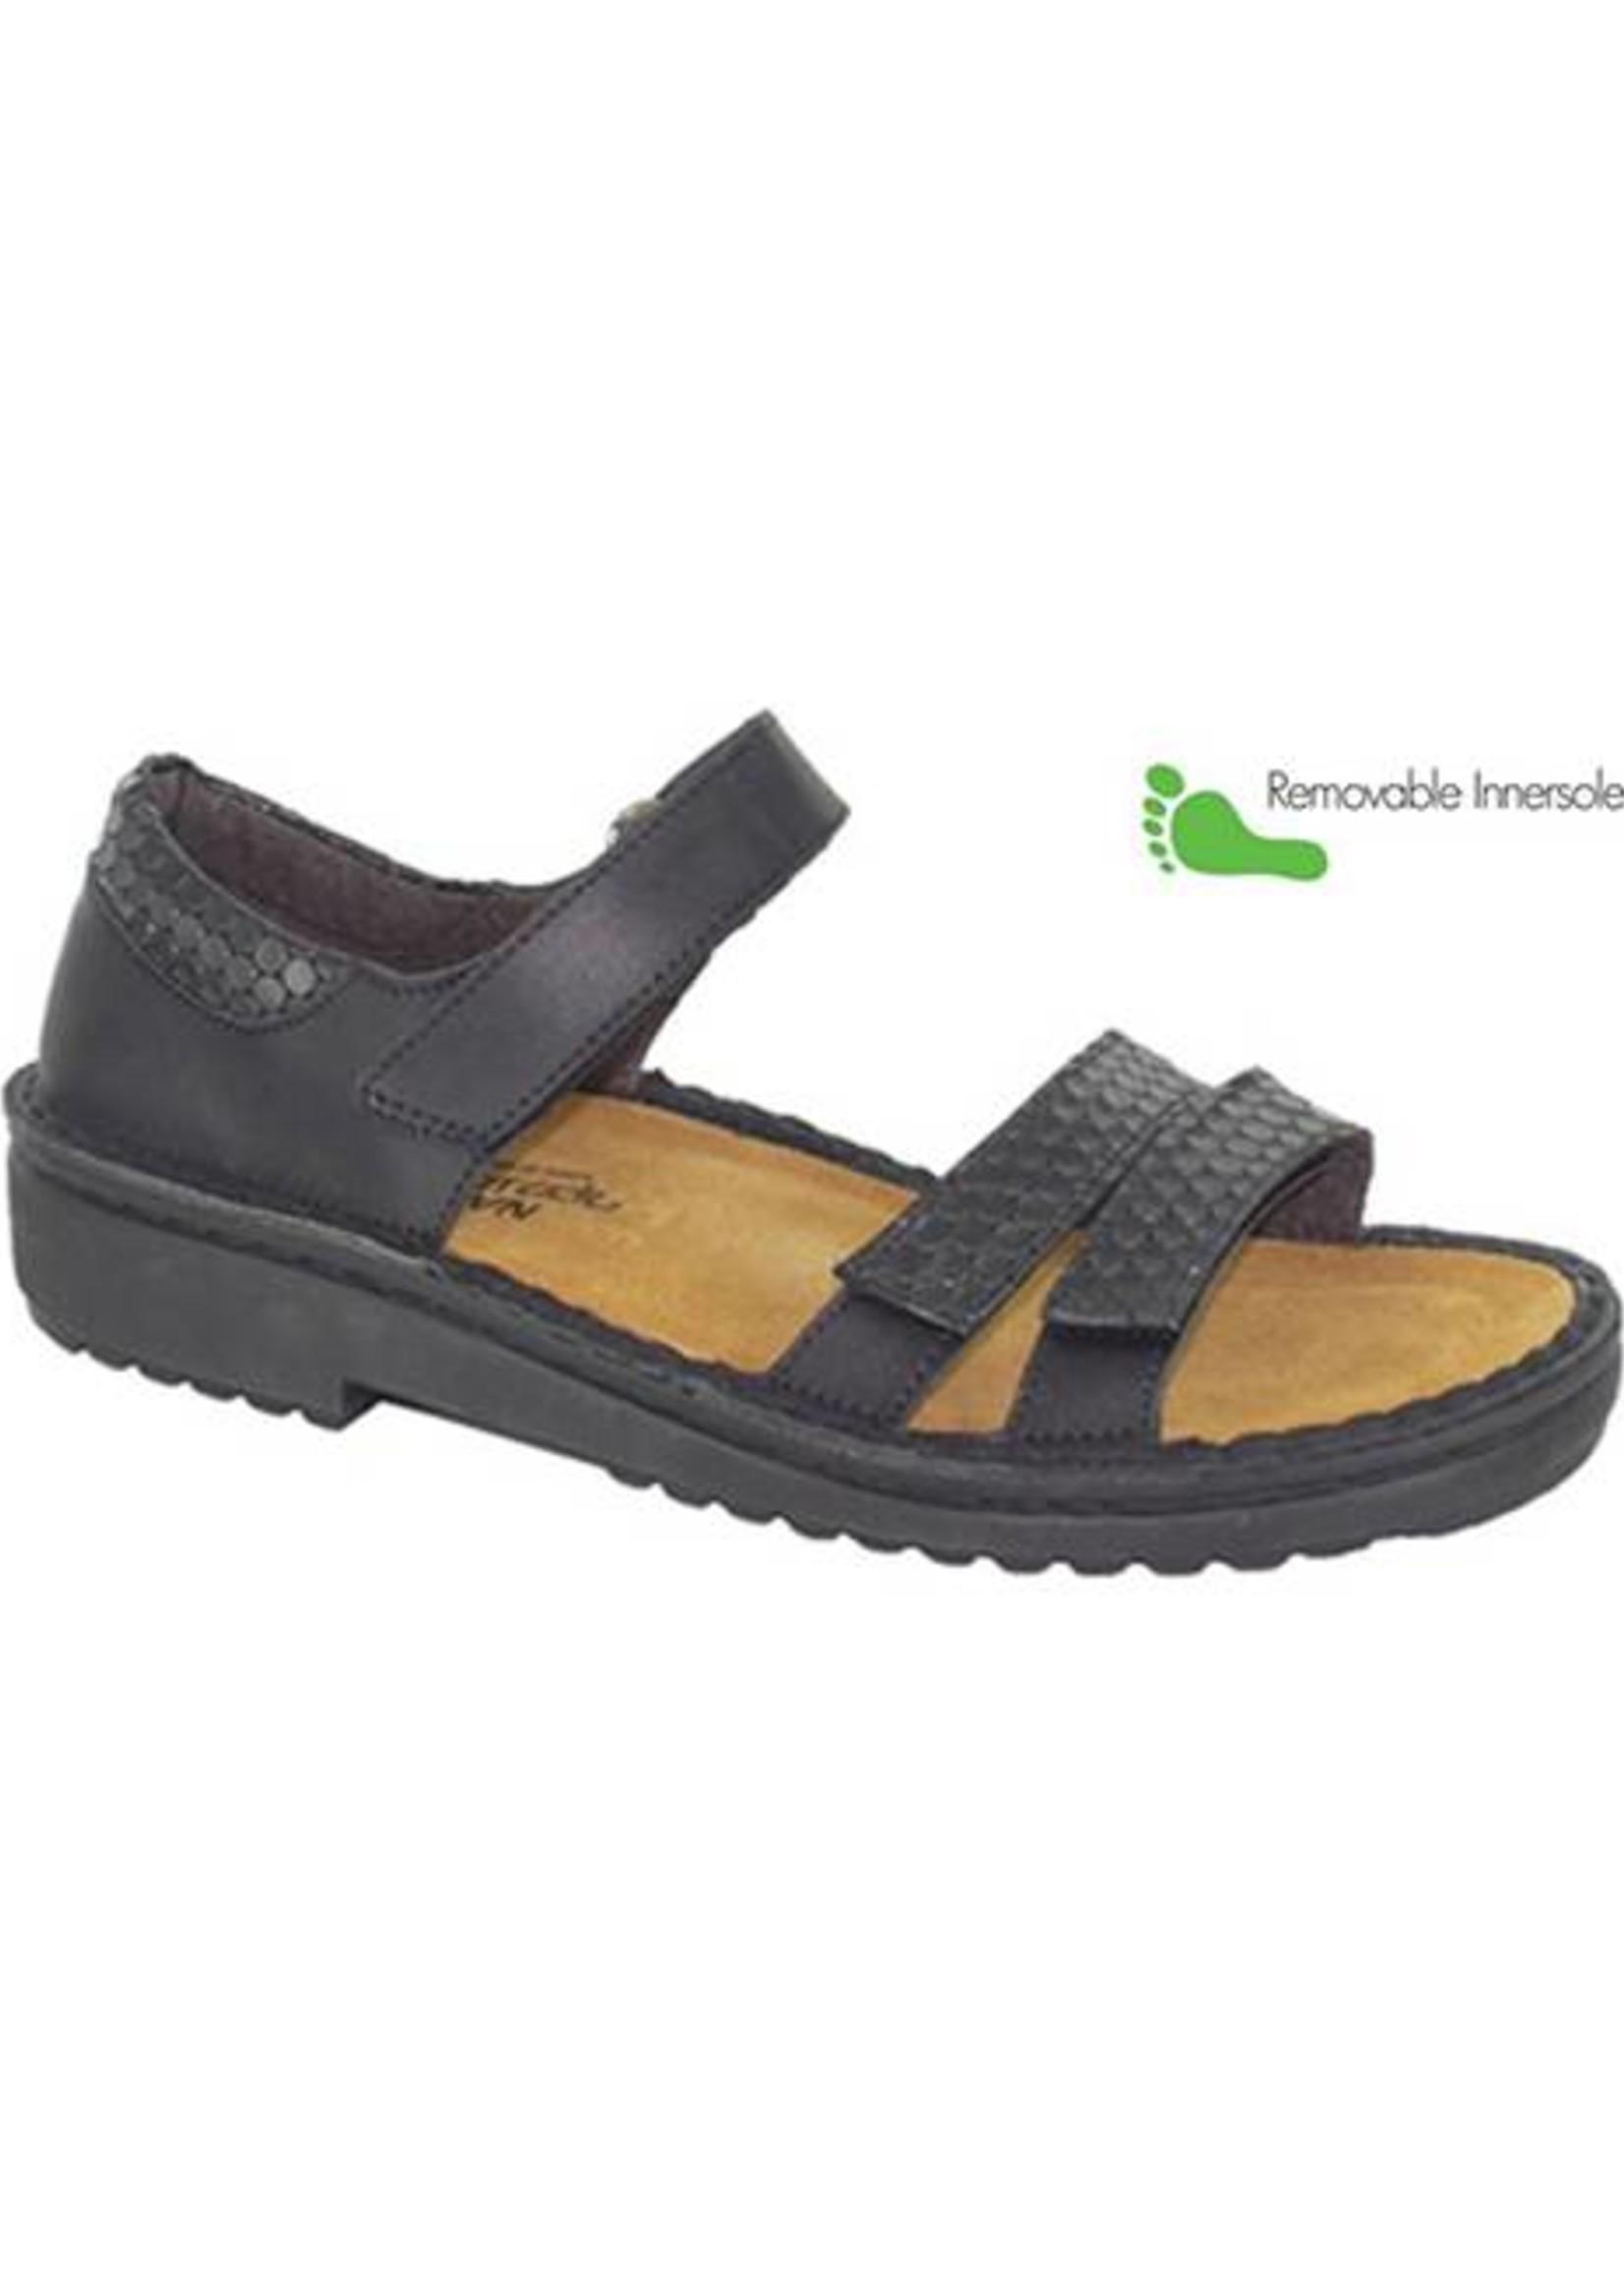 Naot Footwear Carlotta in Black Combo